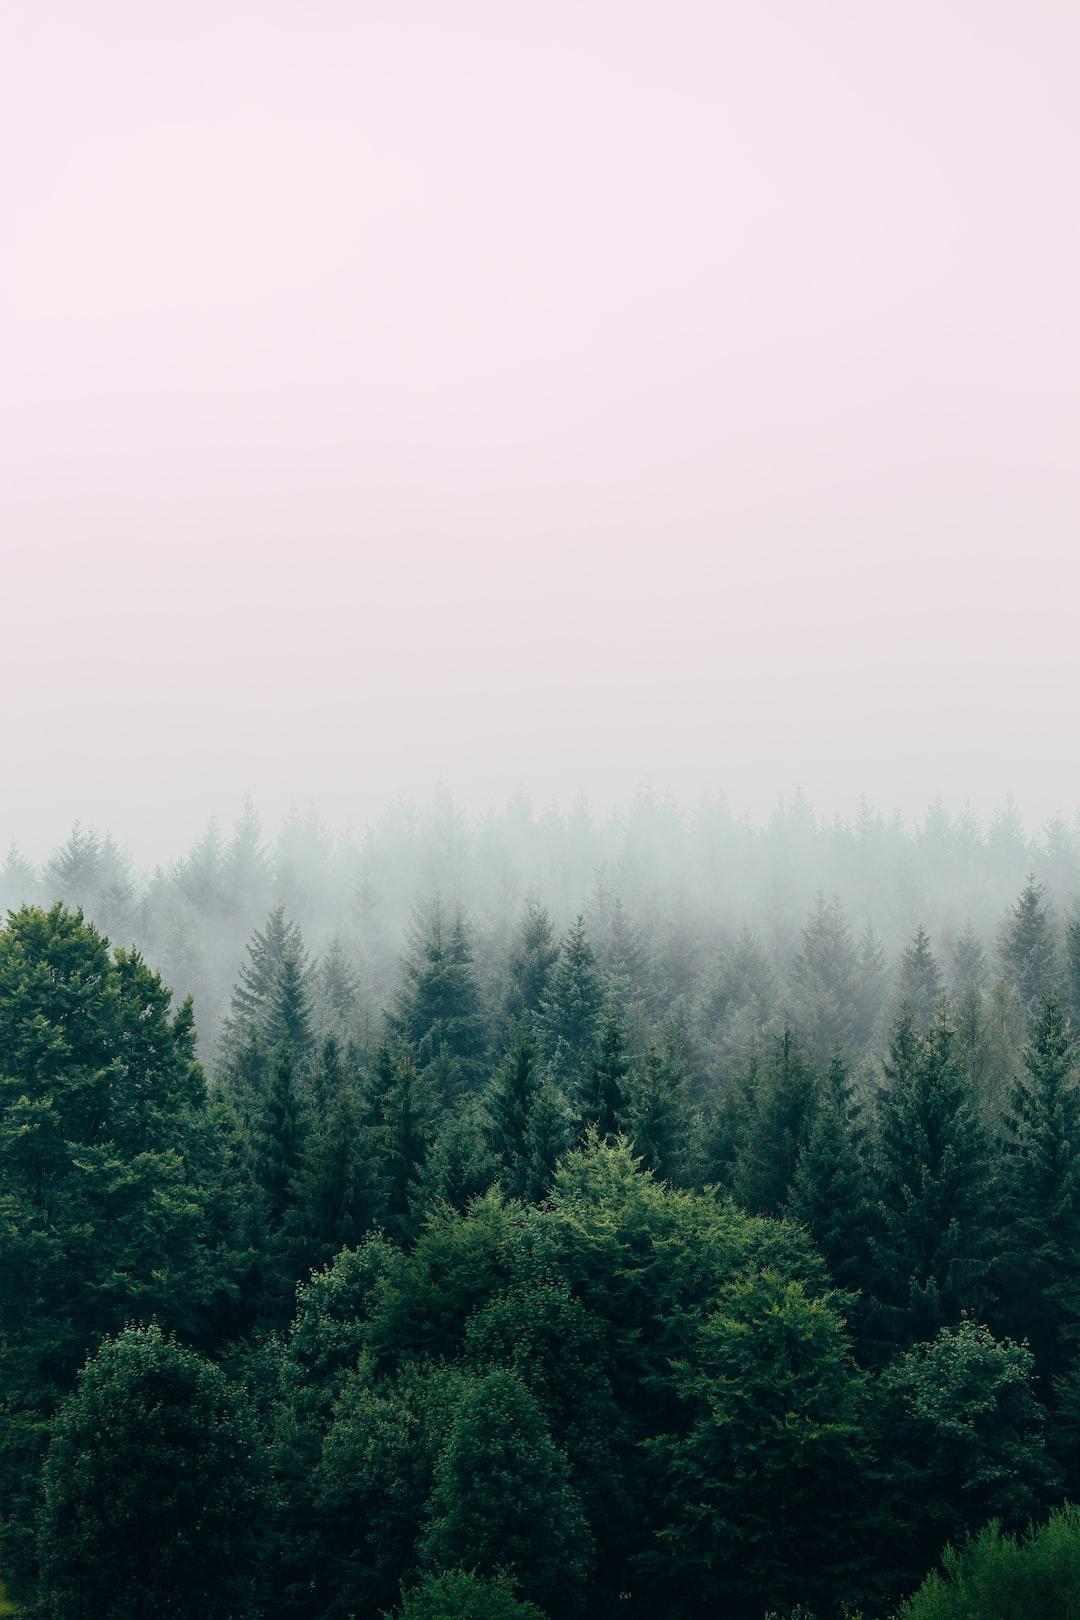 Snow Pine Tree Png